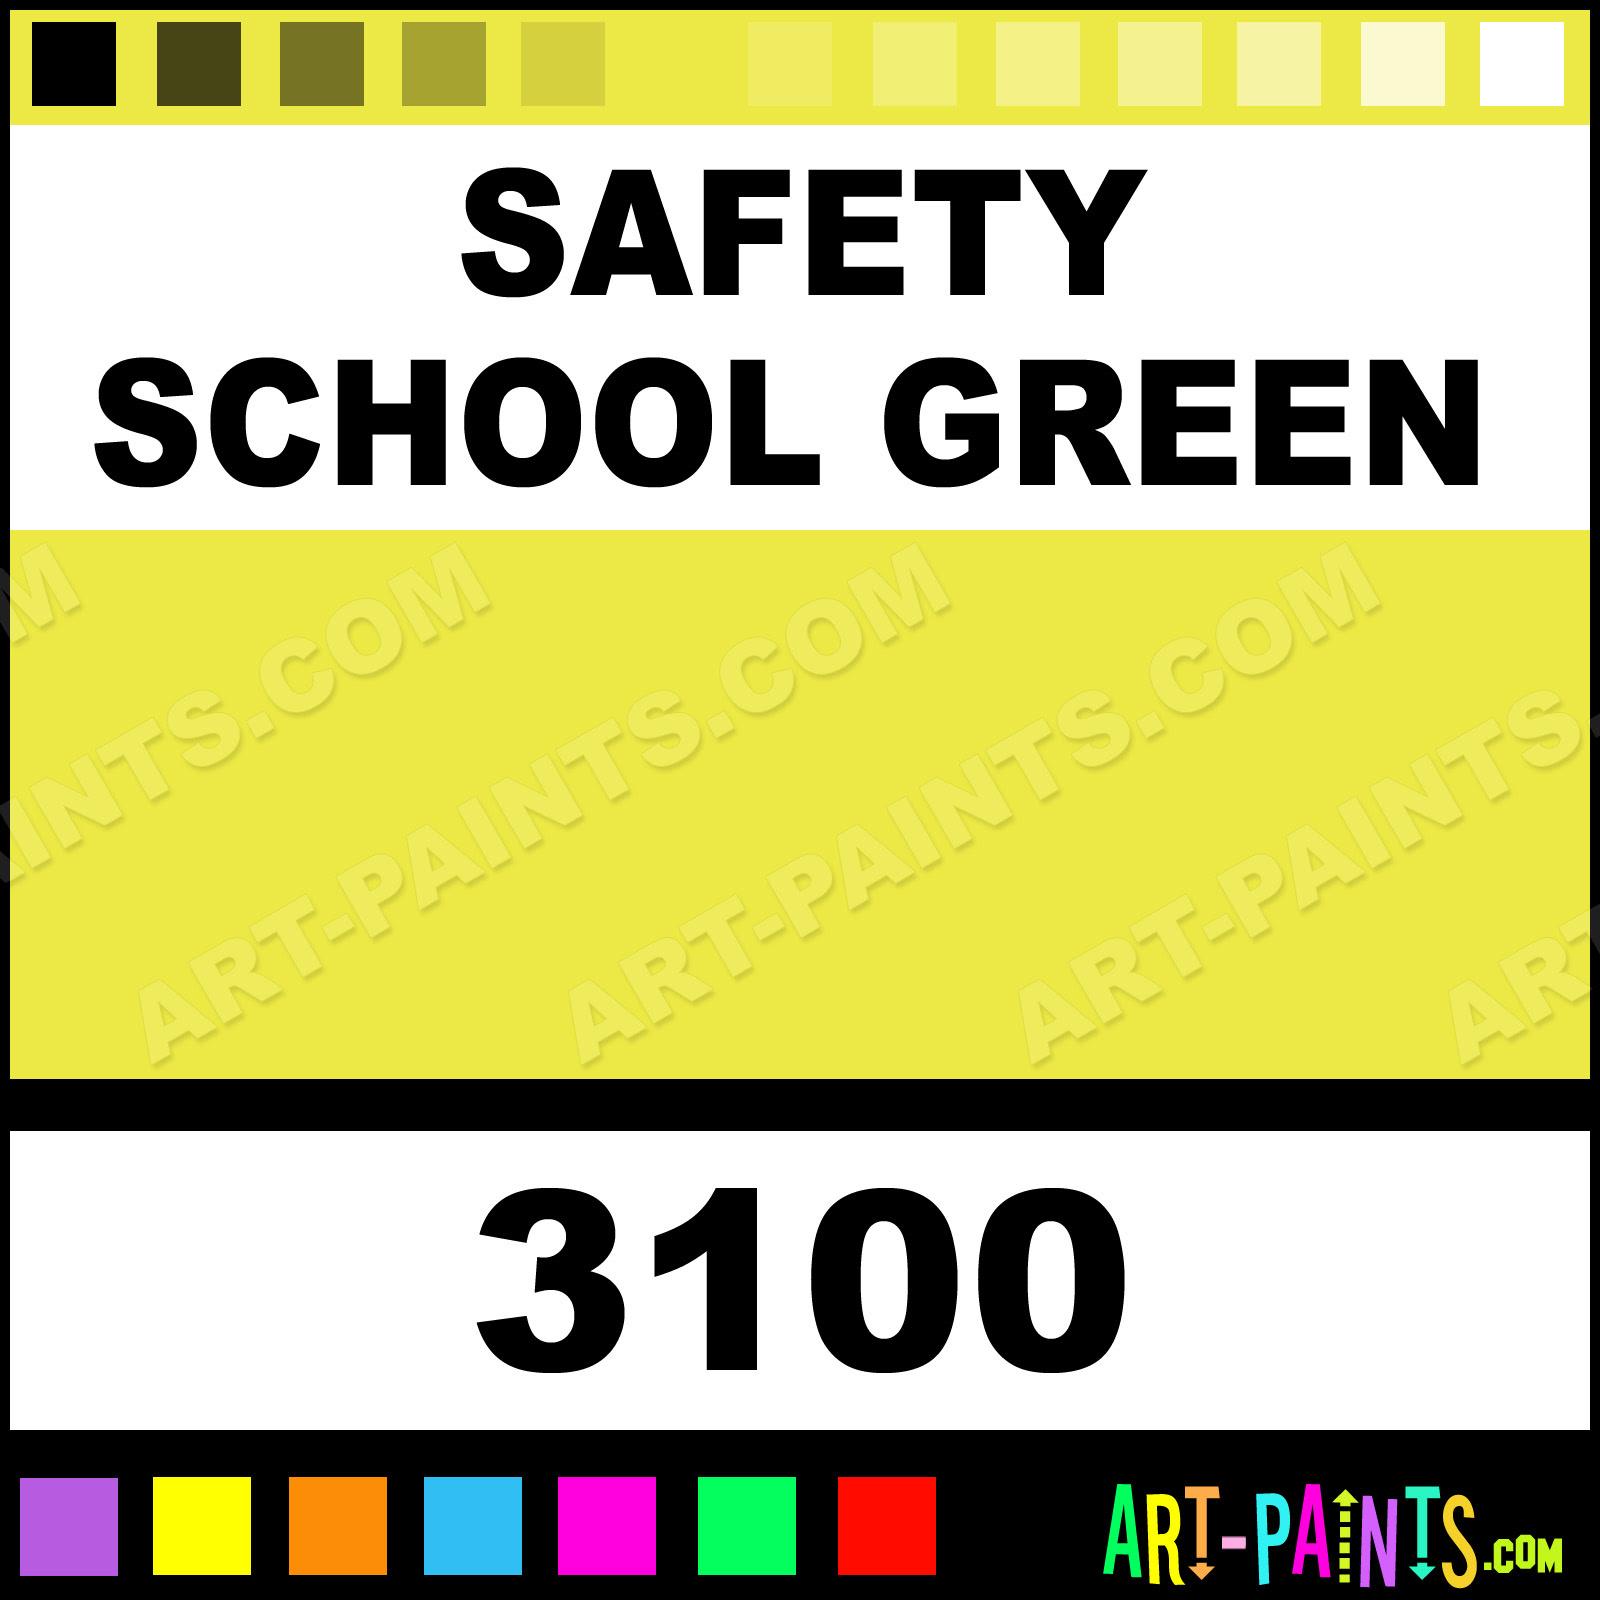 Safety School Green Fluorescent Spray Paints - 3100 - Safety School Green Paint, Safety School ...